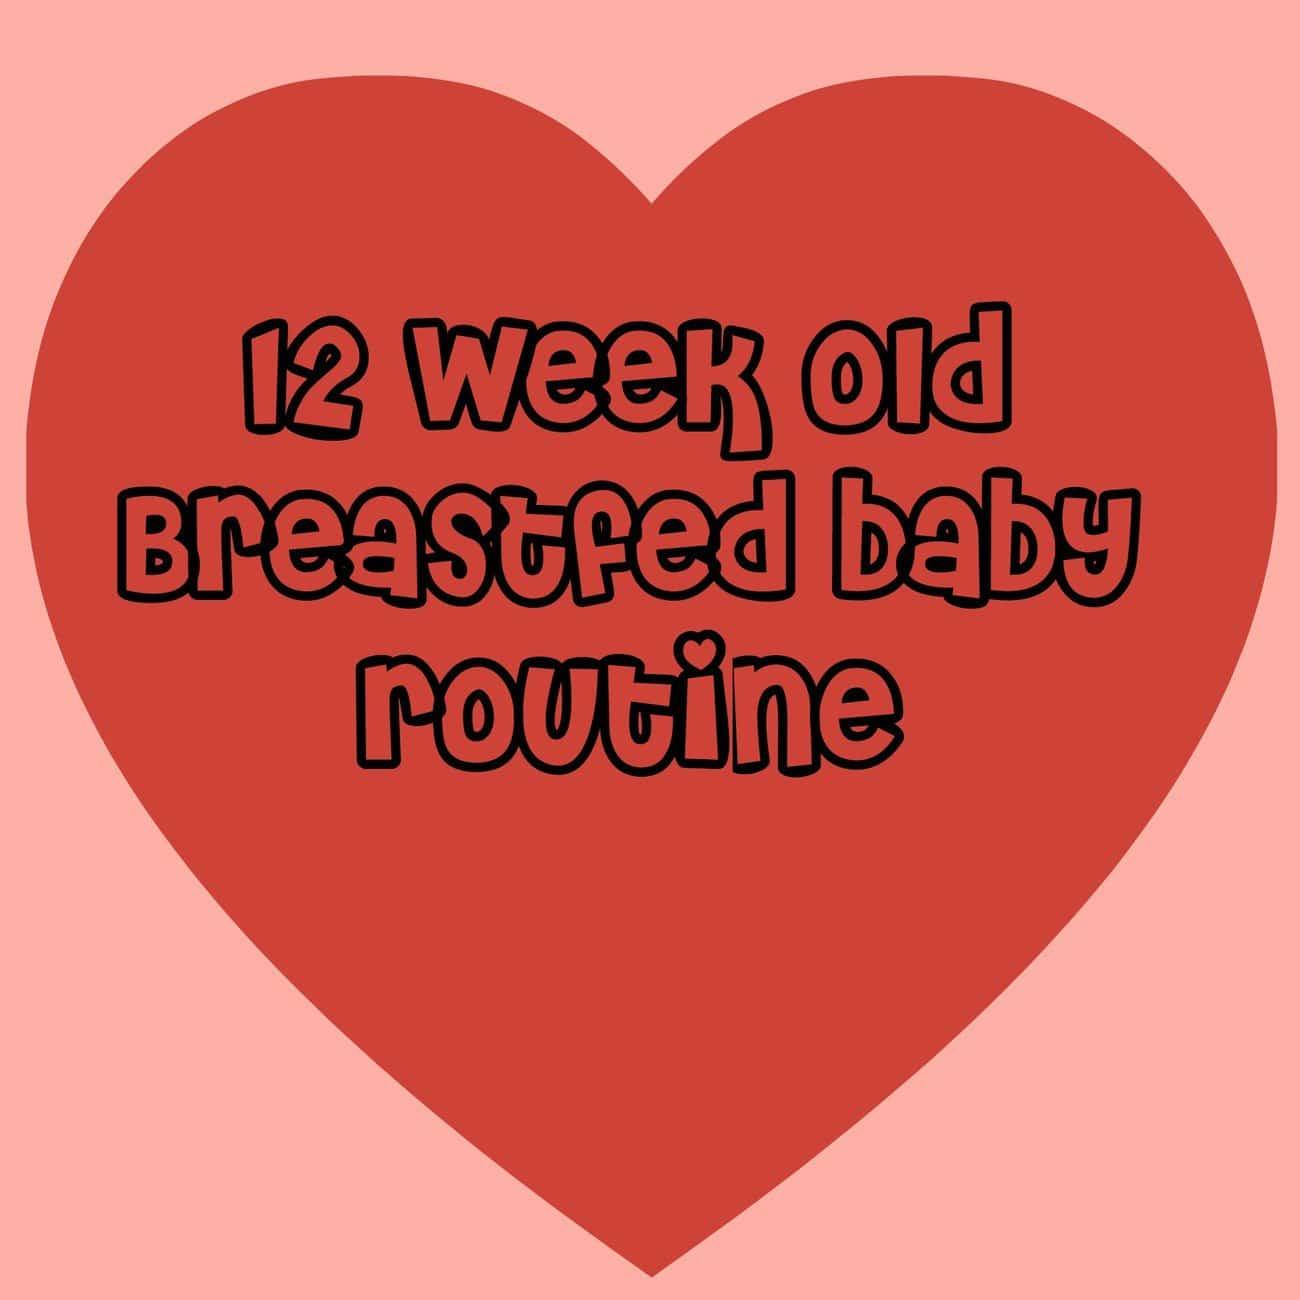 12 week old baby routine